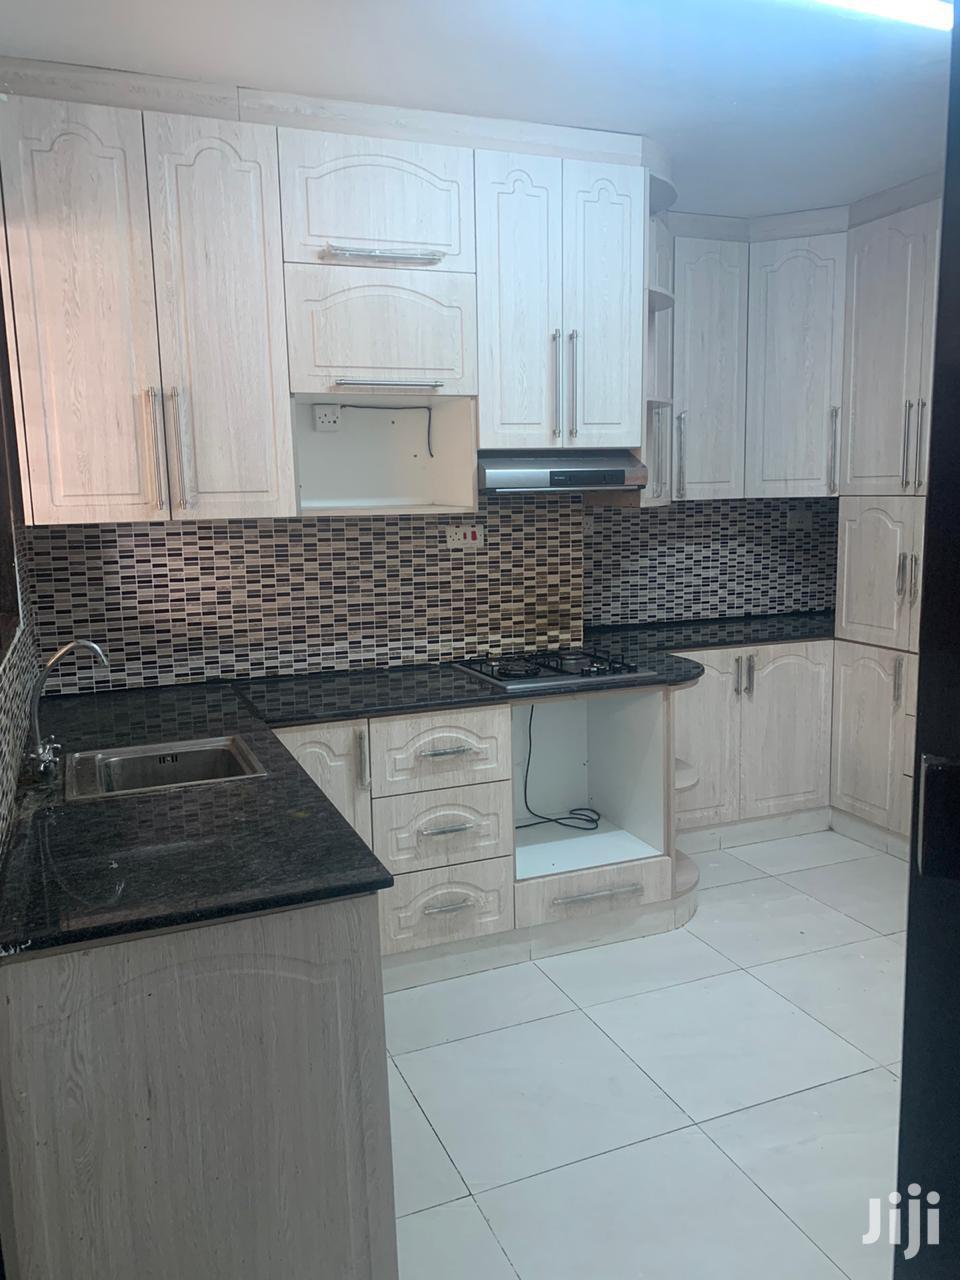 4 Bedron Apartment Kizingo   Houses & Apartments For Sale for sale in Nyali (Mkomani), Mombasa, Kenya